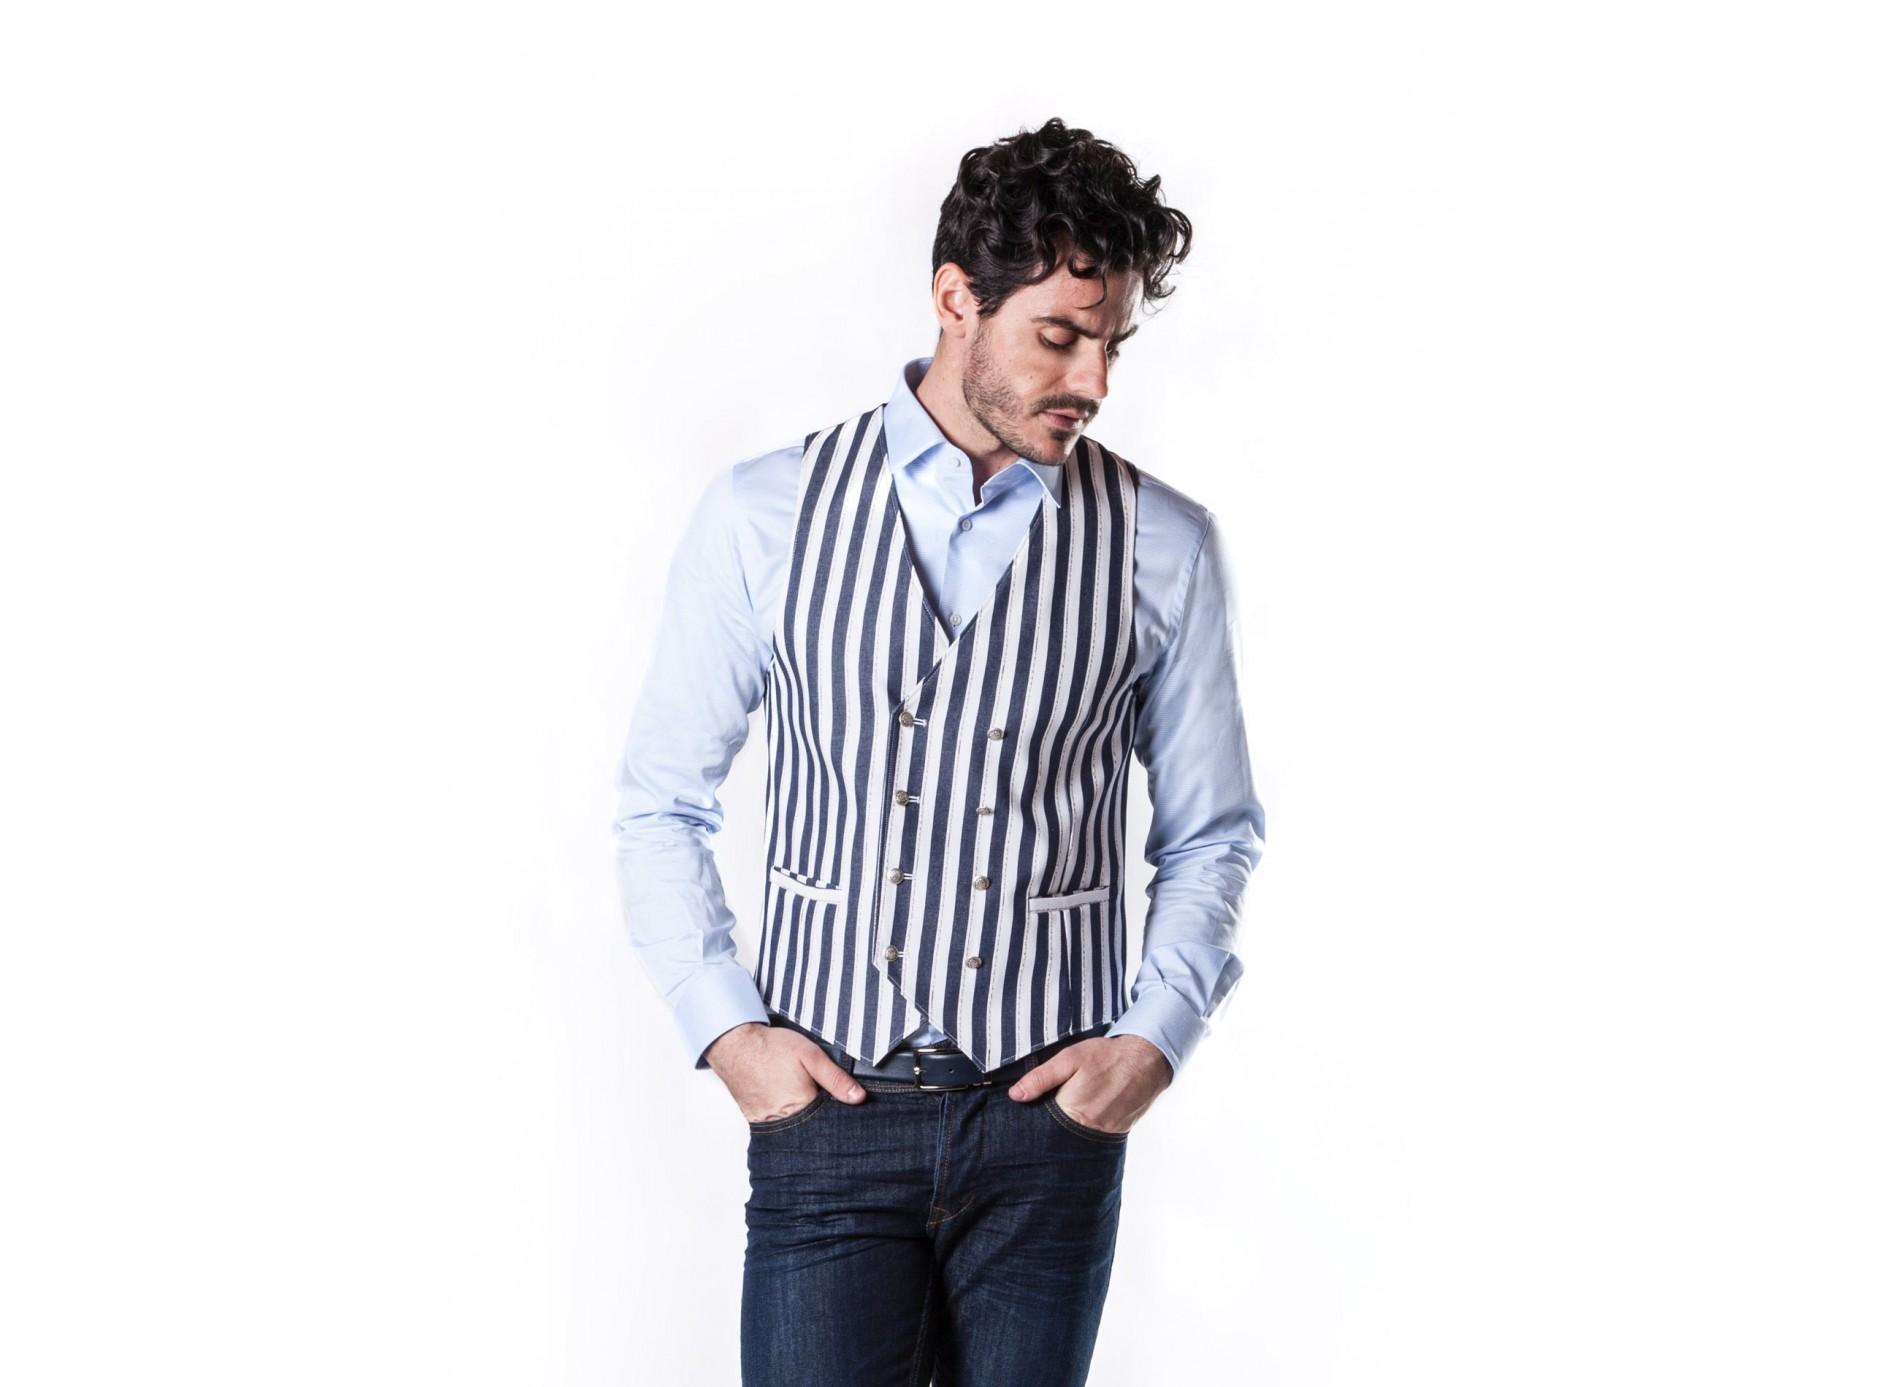 Blazer Jersey Taglia 52 Bianco Nero a Strisce Strisce Giacca Struttura Nuovo